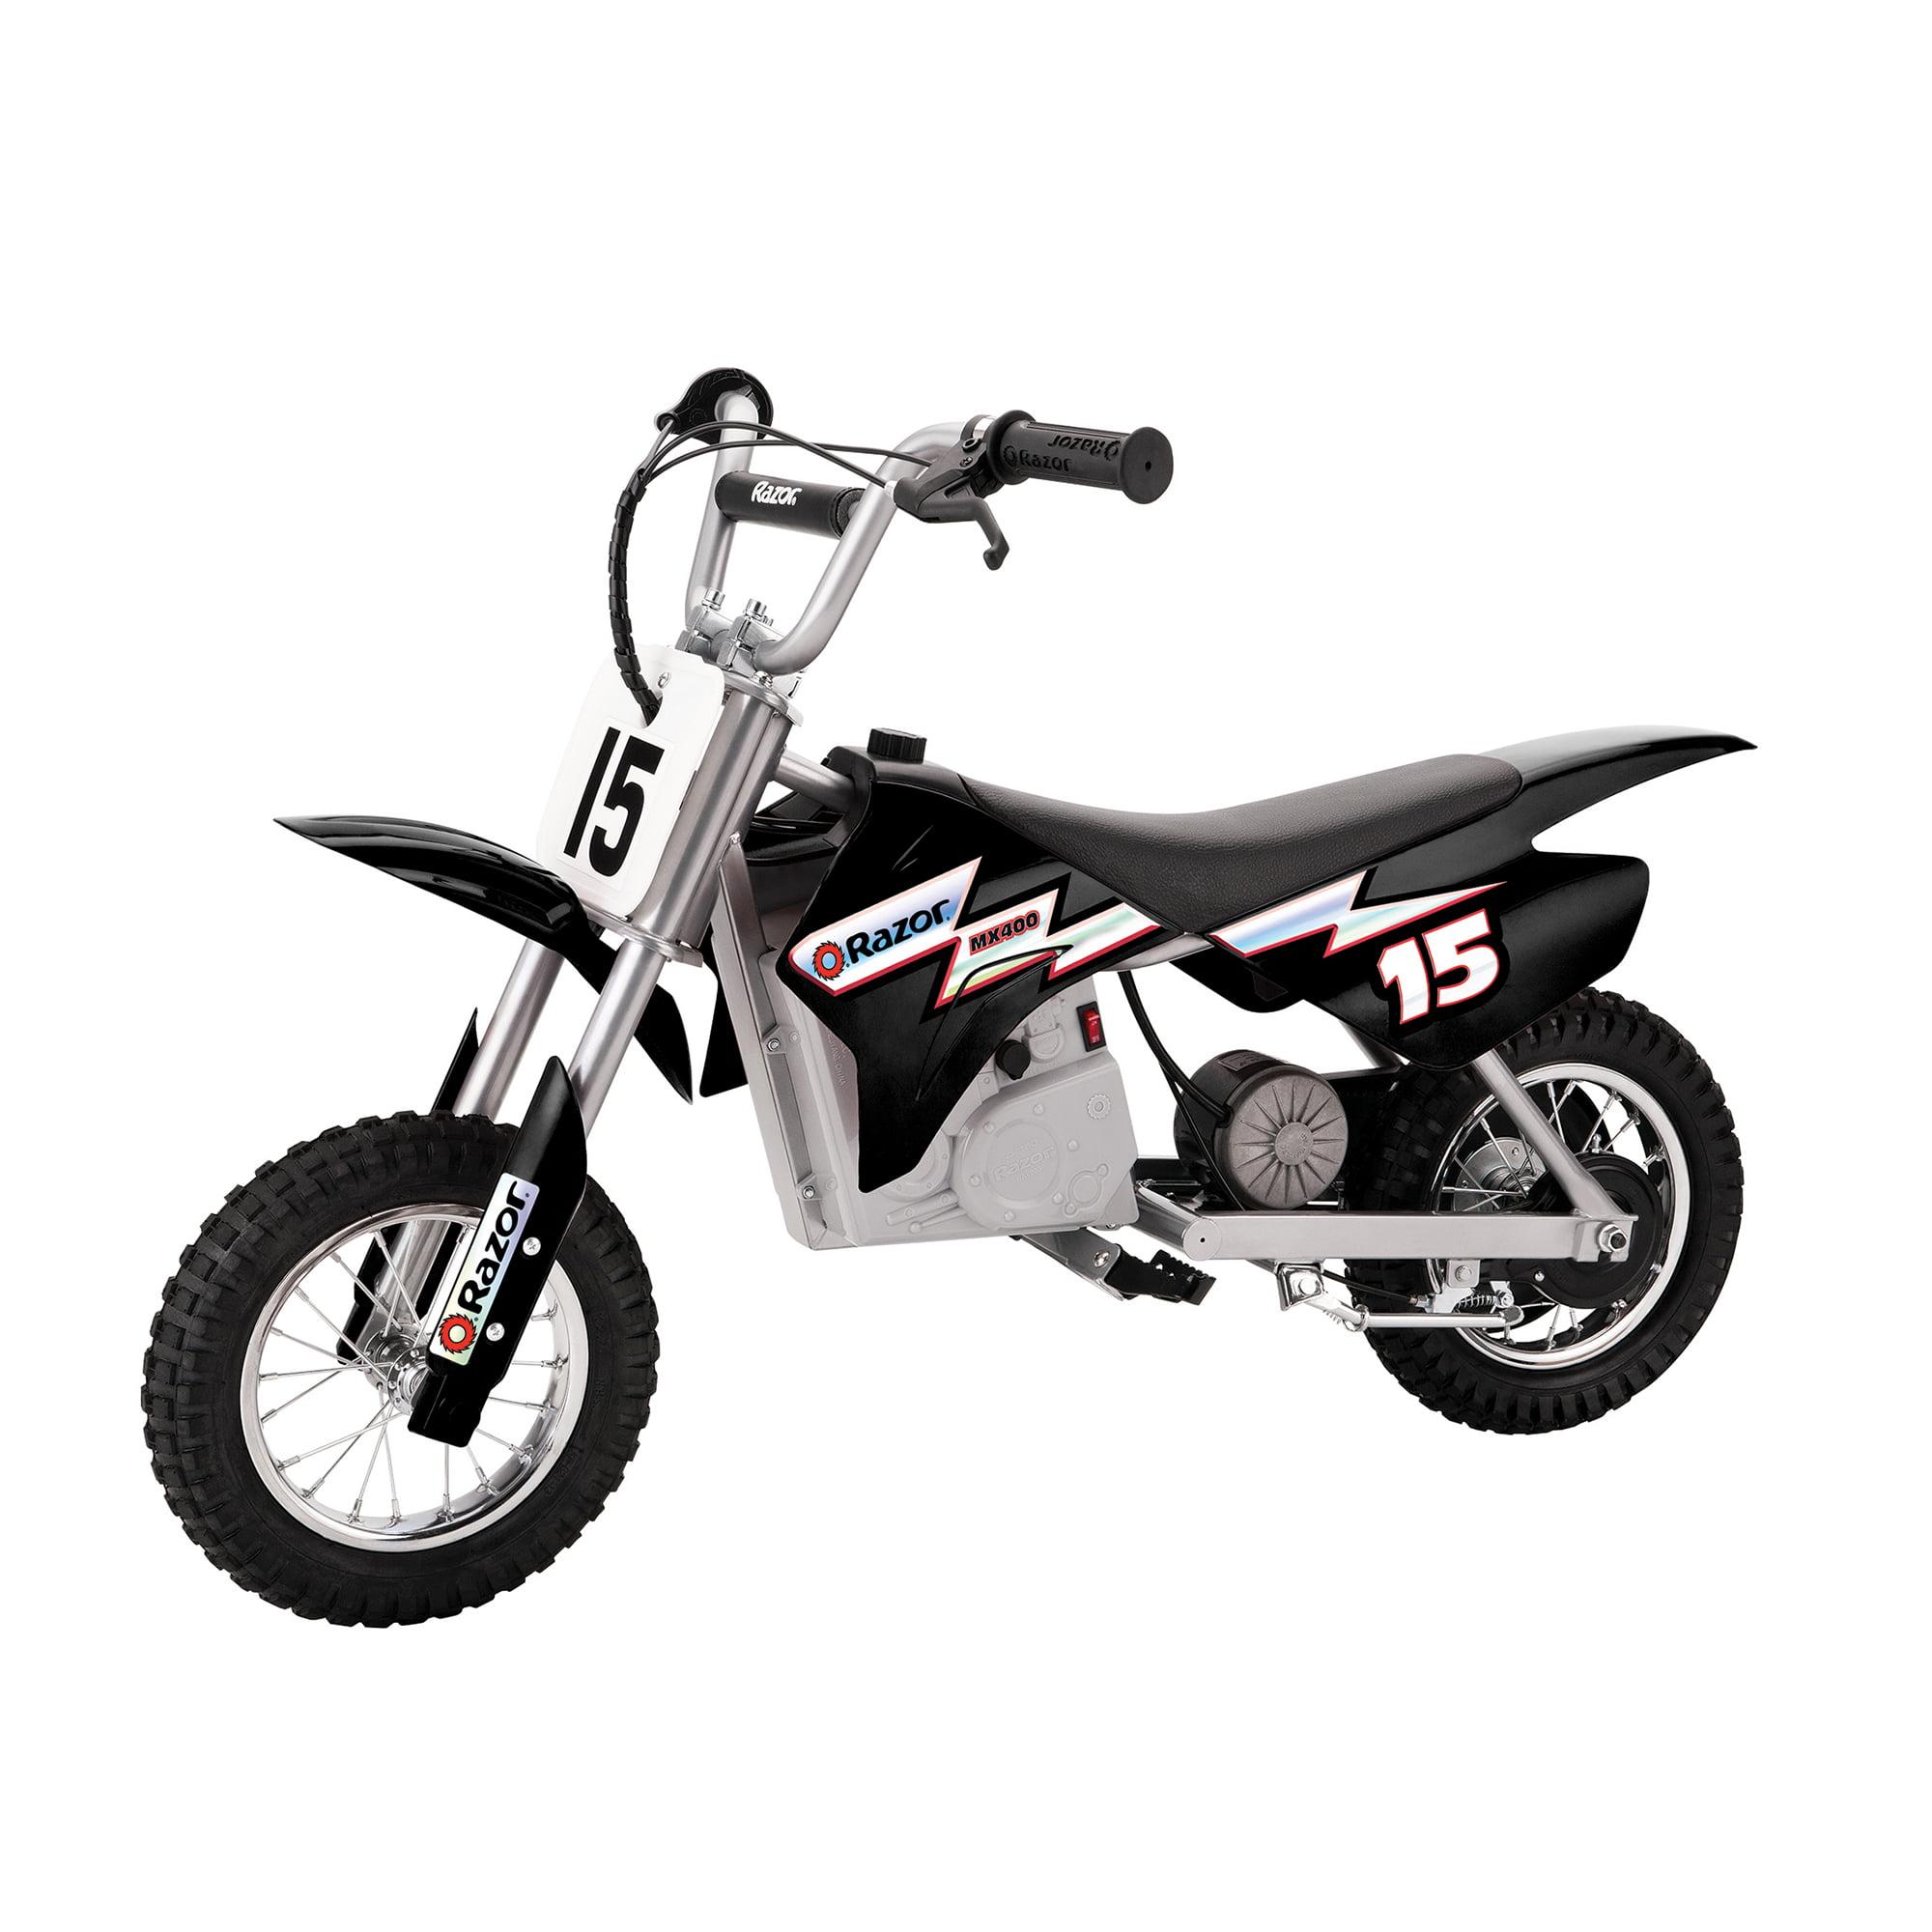 Razor MX350 Dirt Rocket 24V Electric Toy Motocross Motorcycle Dirt Bike, Black by Razor